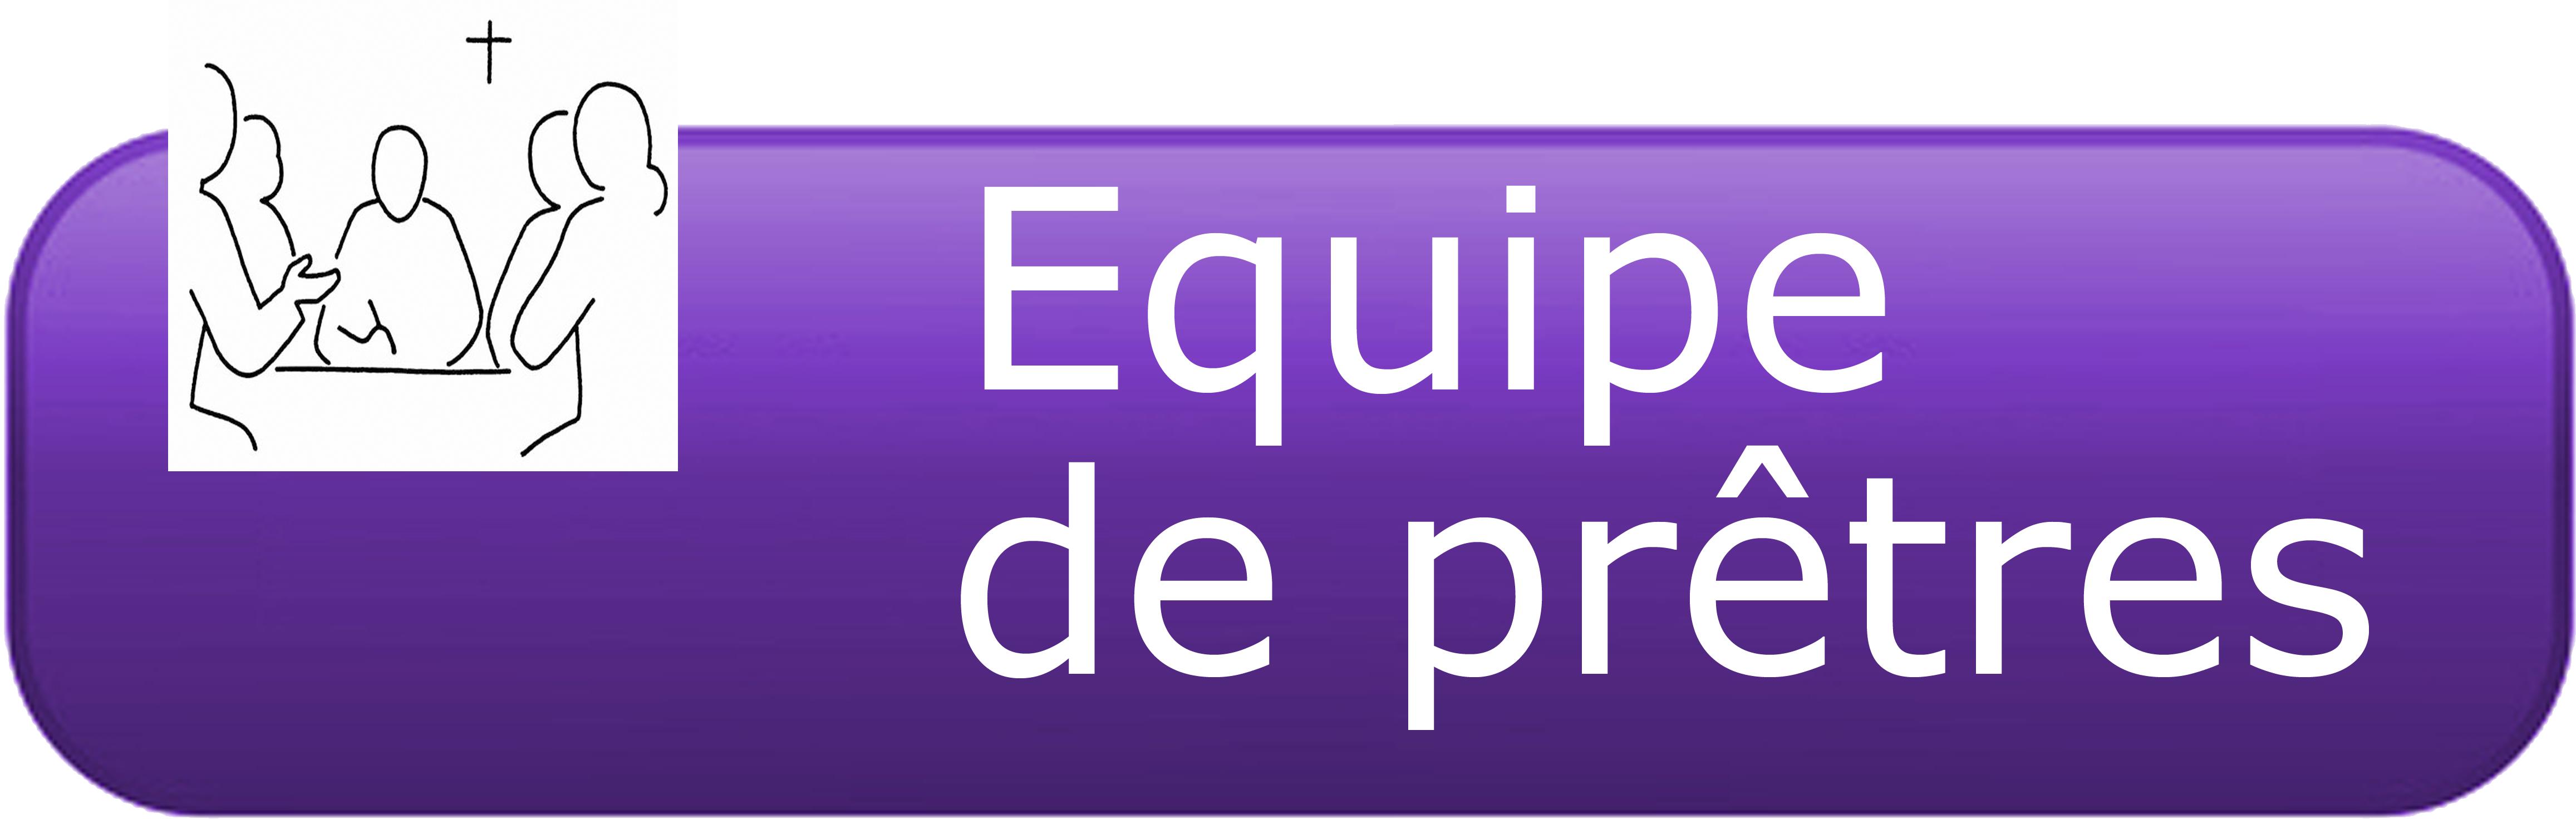 Ico Prêtres